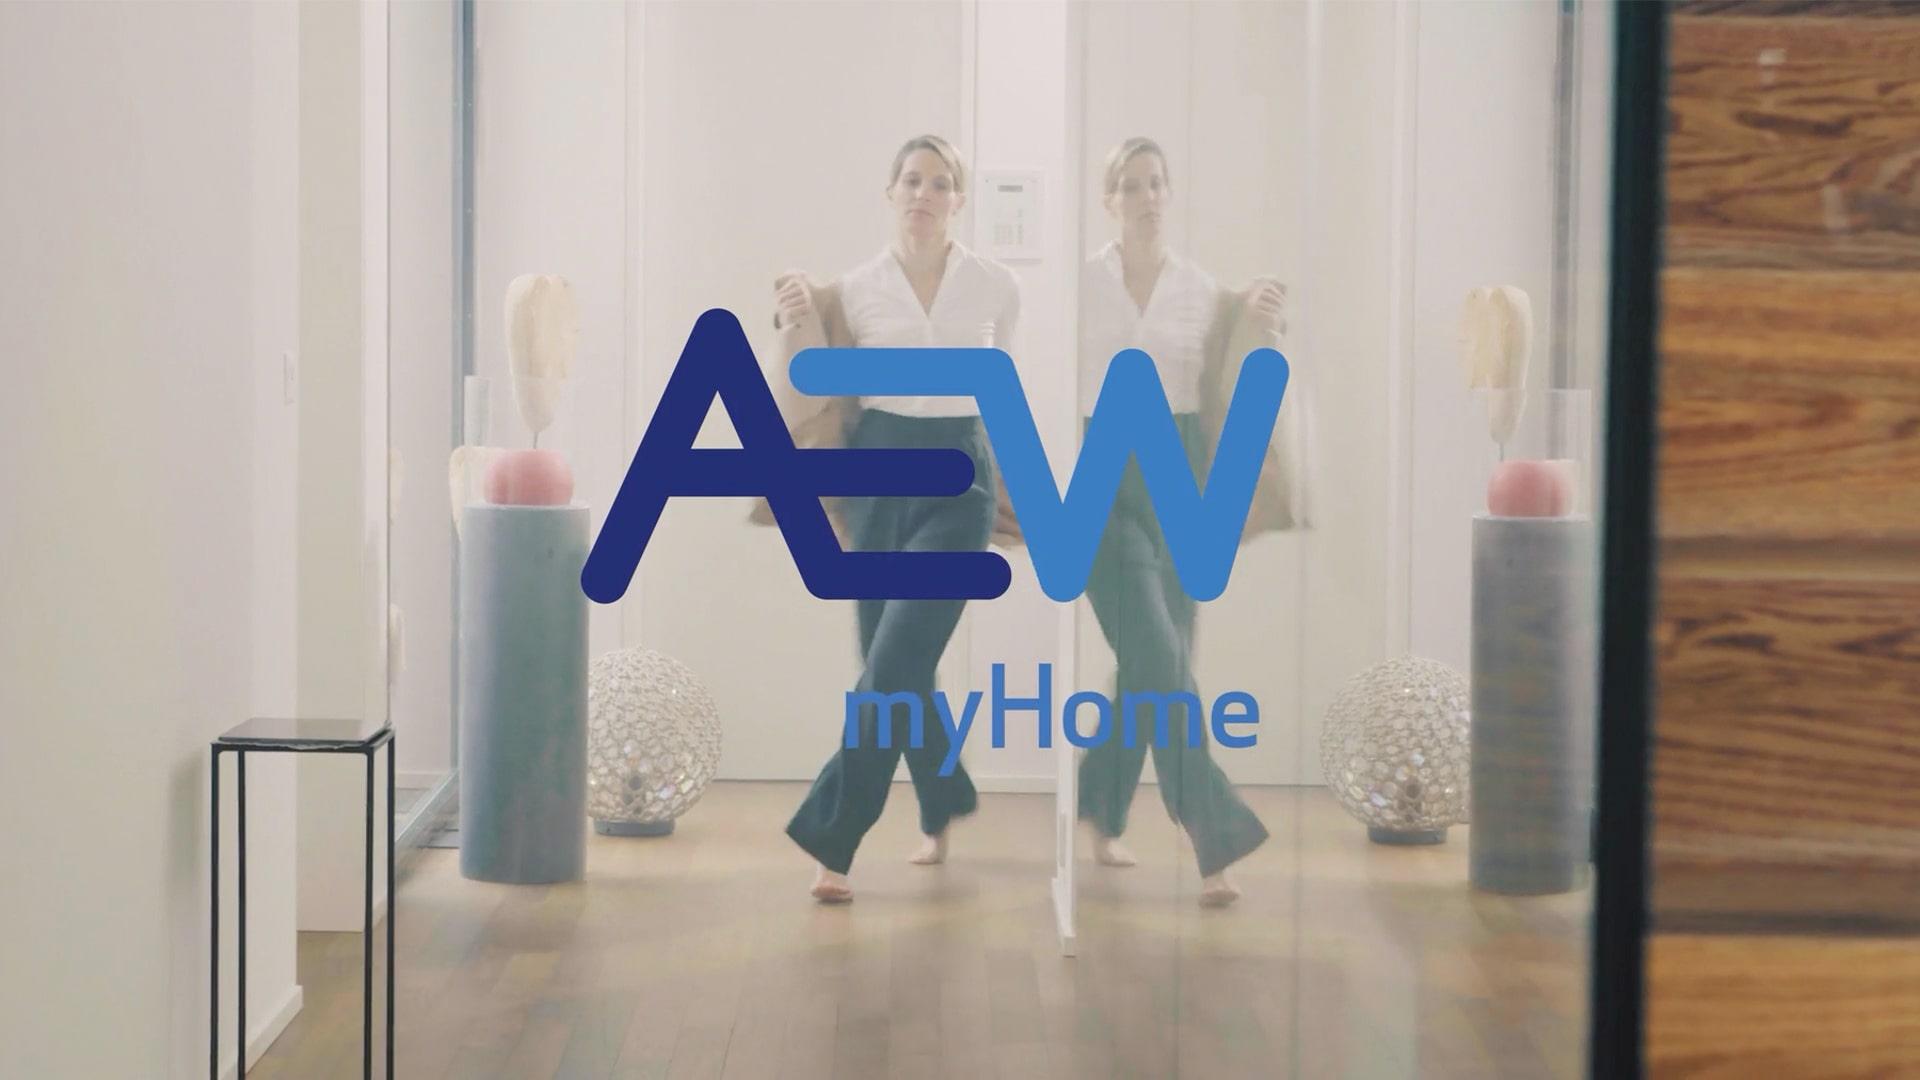 AEW | MyHome